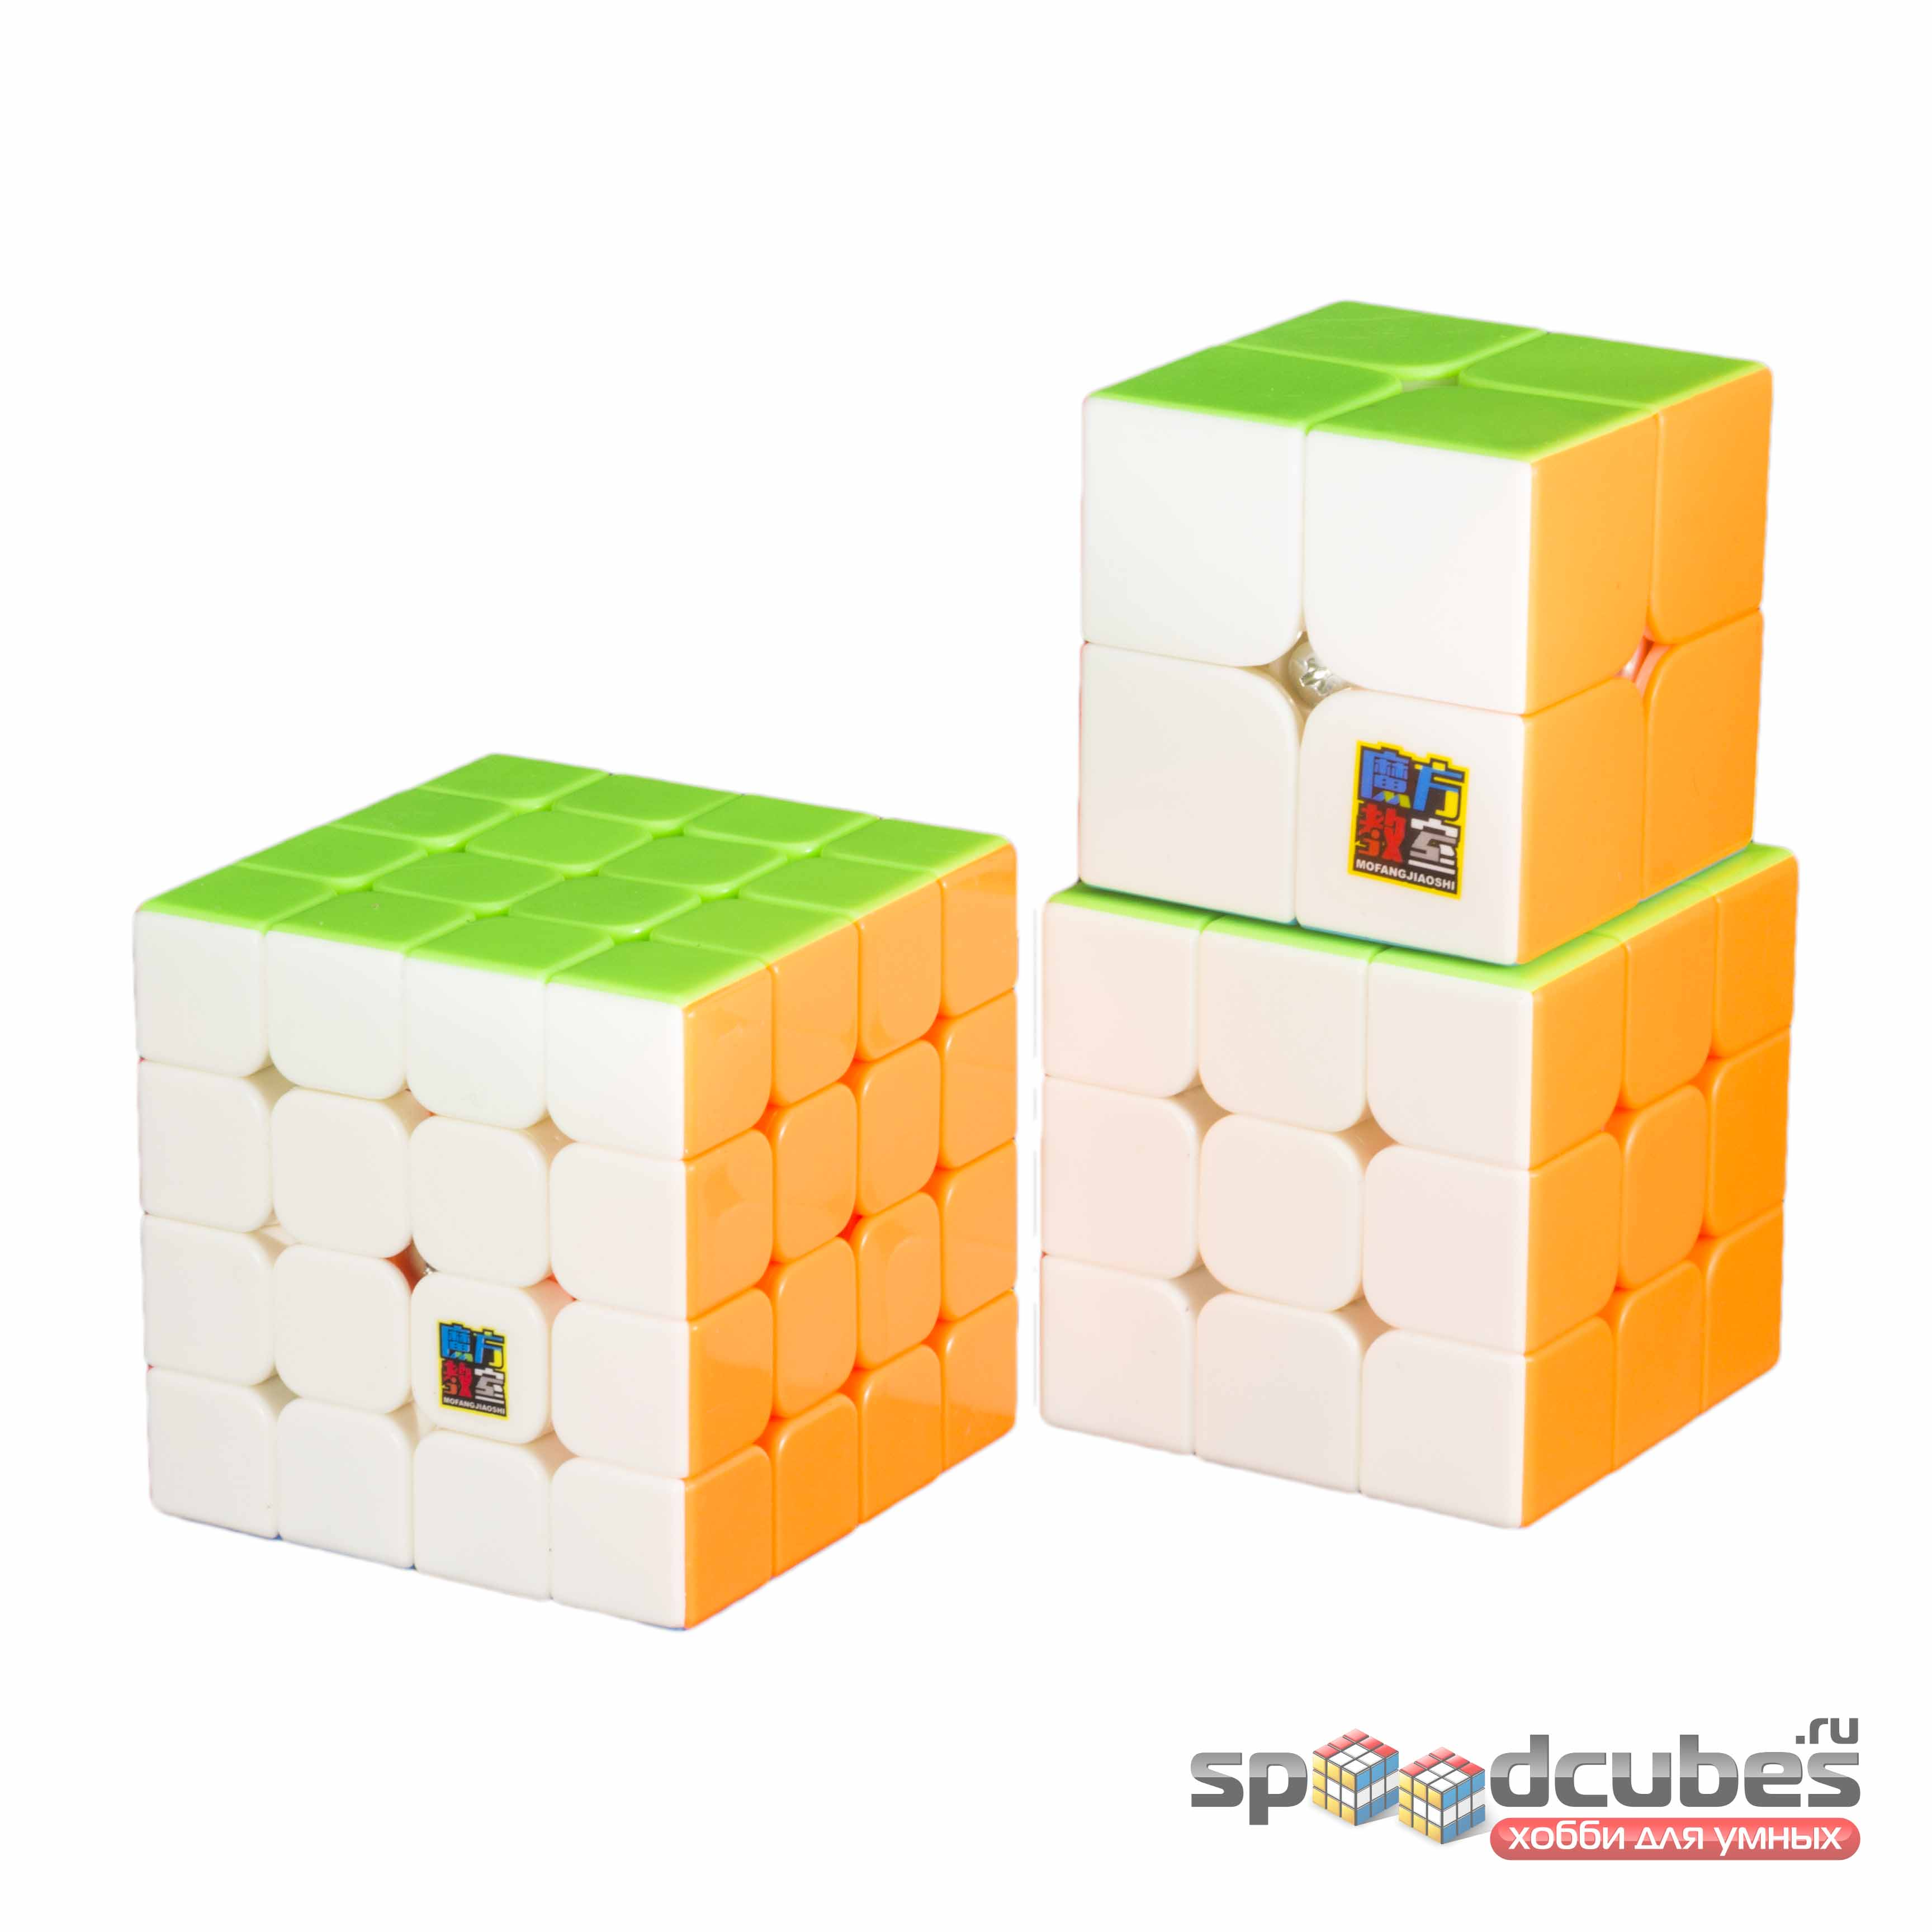 MoYu Cubing Classroom Mini (набор Moyu MF2s, MF3s, MF4s)